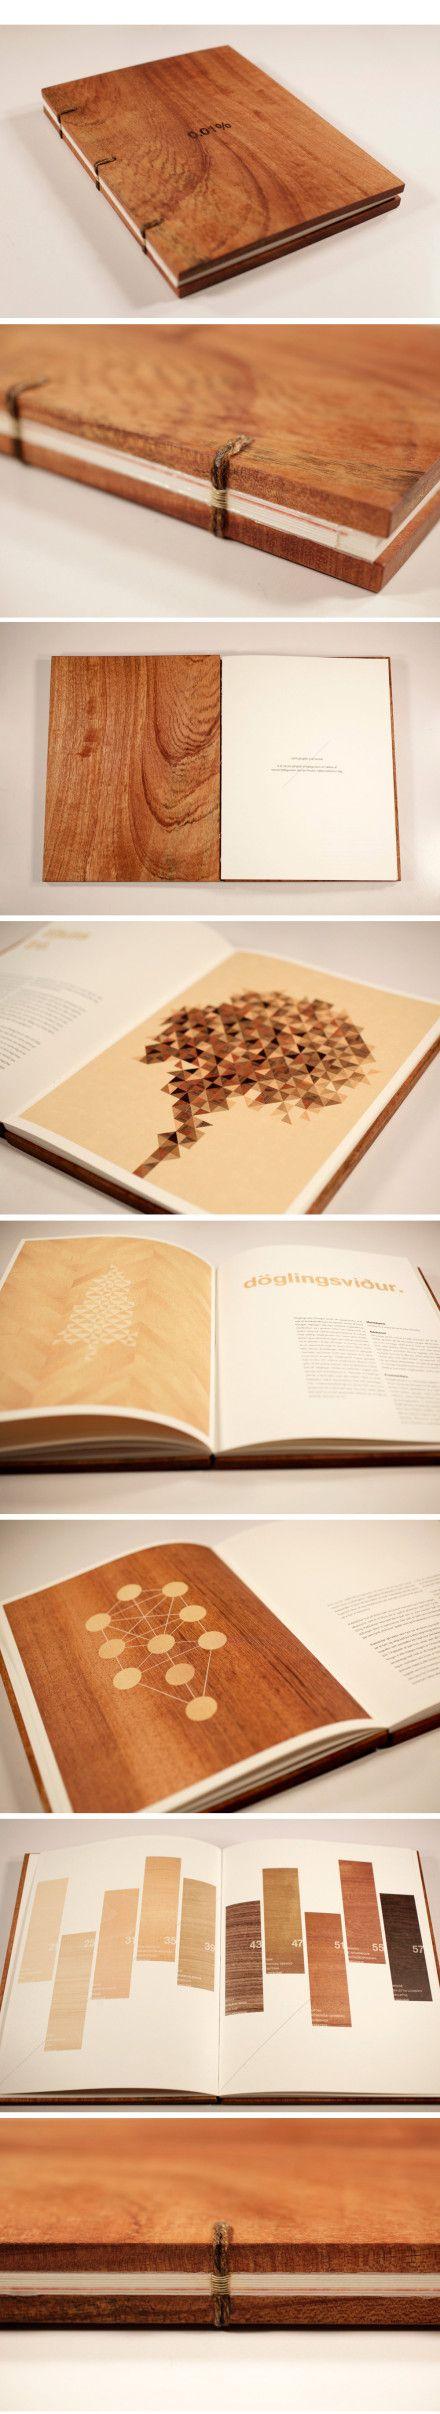 Fadenheftung buch mit holzcover graphic design art for Buch design